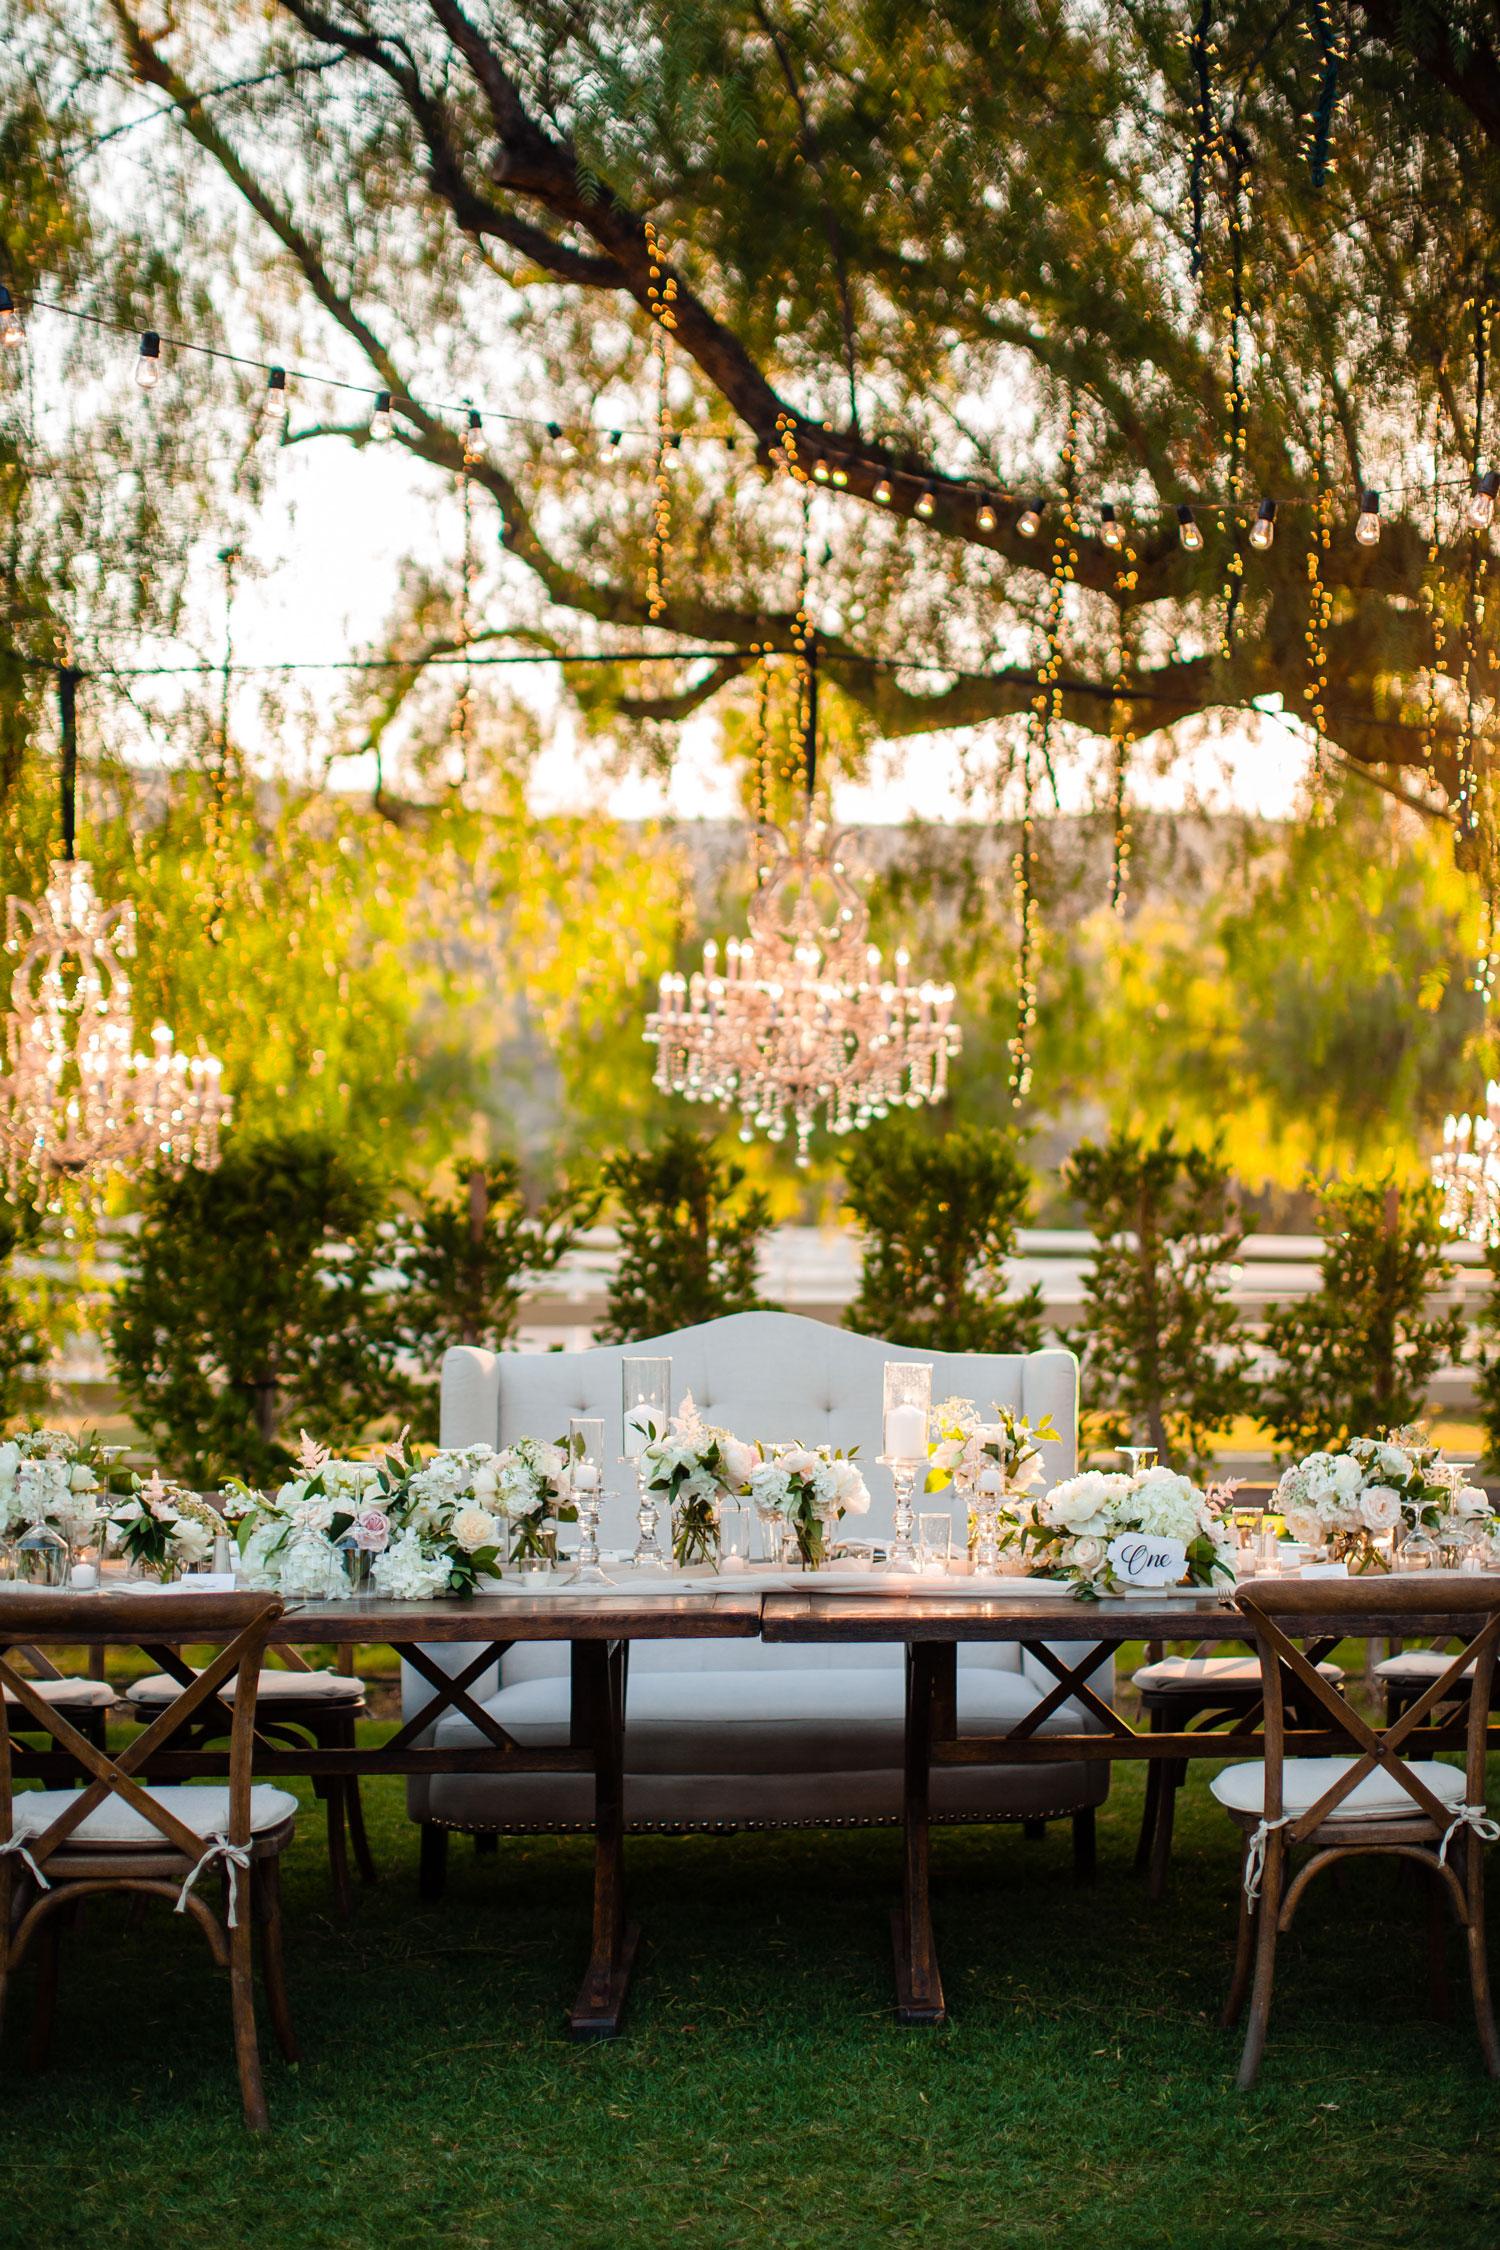 wedding reception outside twinkle lights vineyard wood chairs sweetheart head table settee tessa lyn events